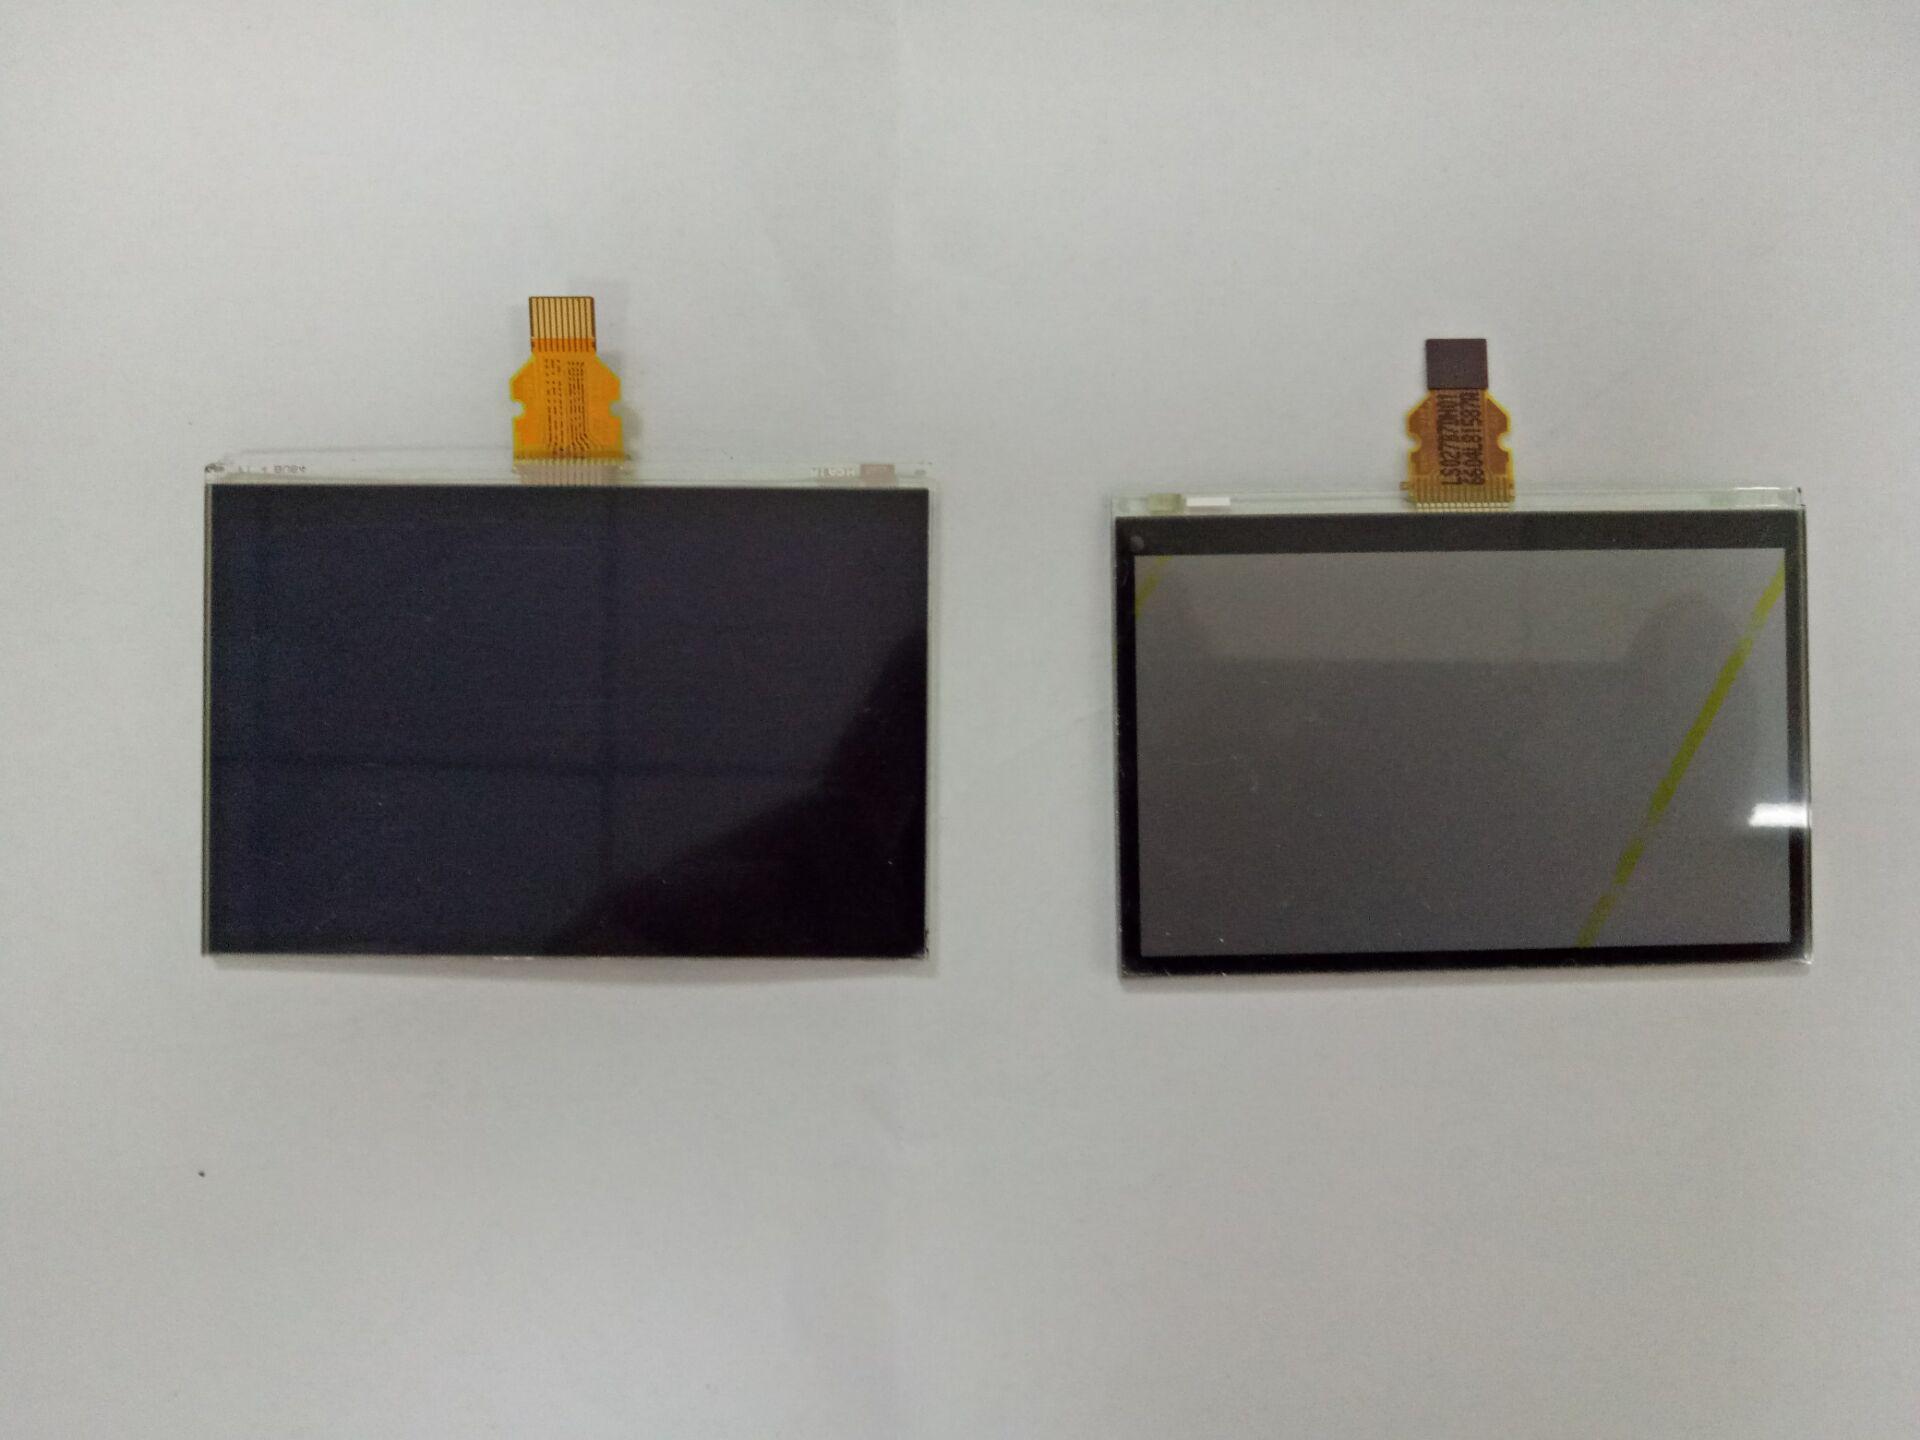 LS027B7DH01A LCD TFT 2.7 inch 400X240LS027B7DH01A LCD TFT 2.7 inch 400X240